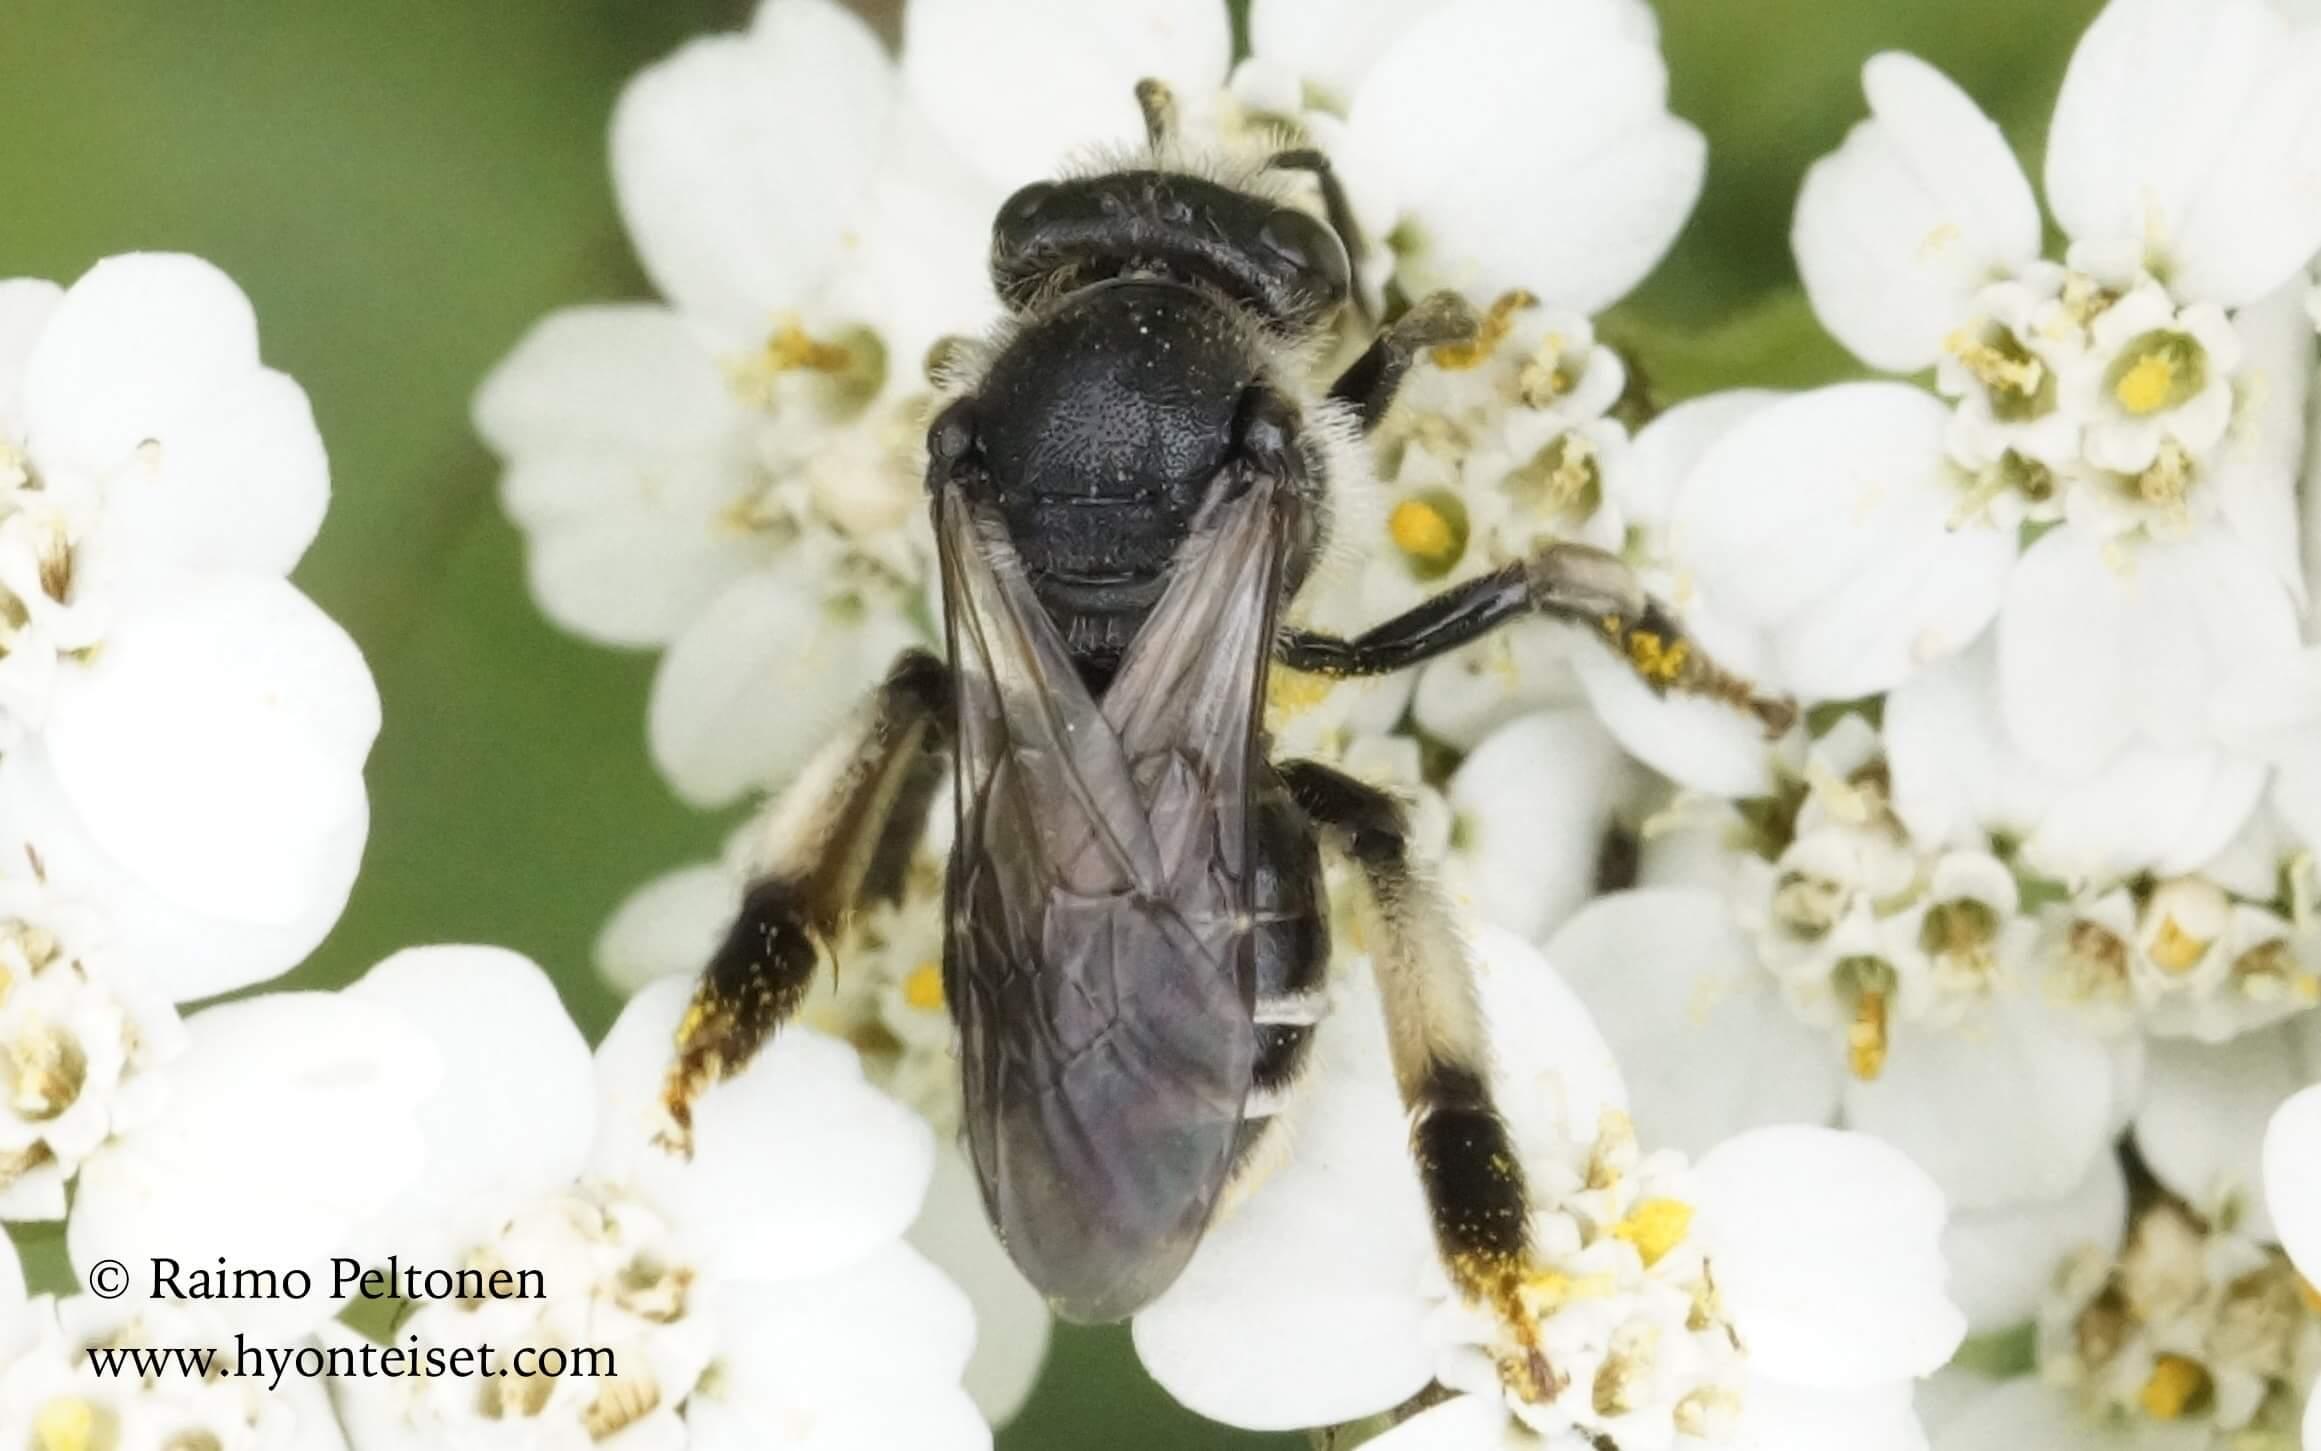 Macropis europaea, naaras (det. Juho Paukkunen)